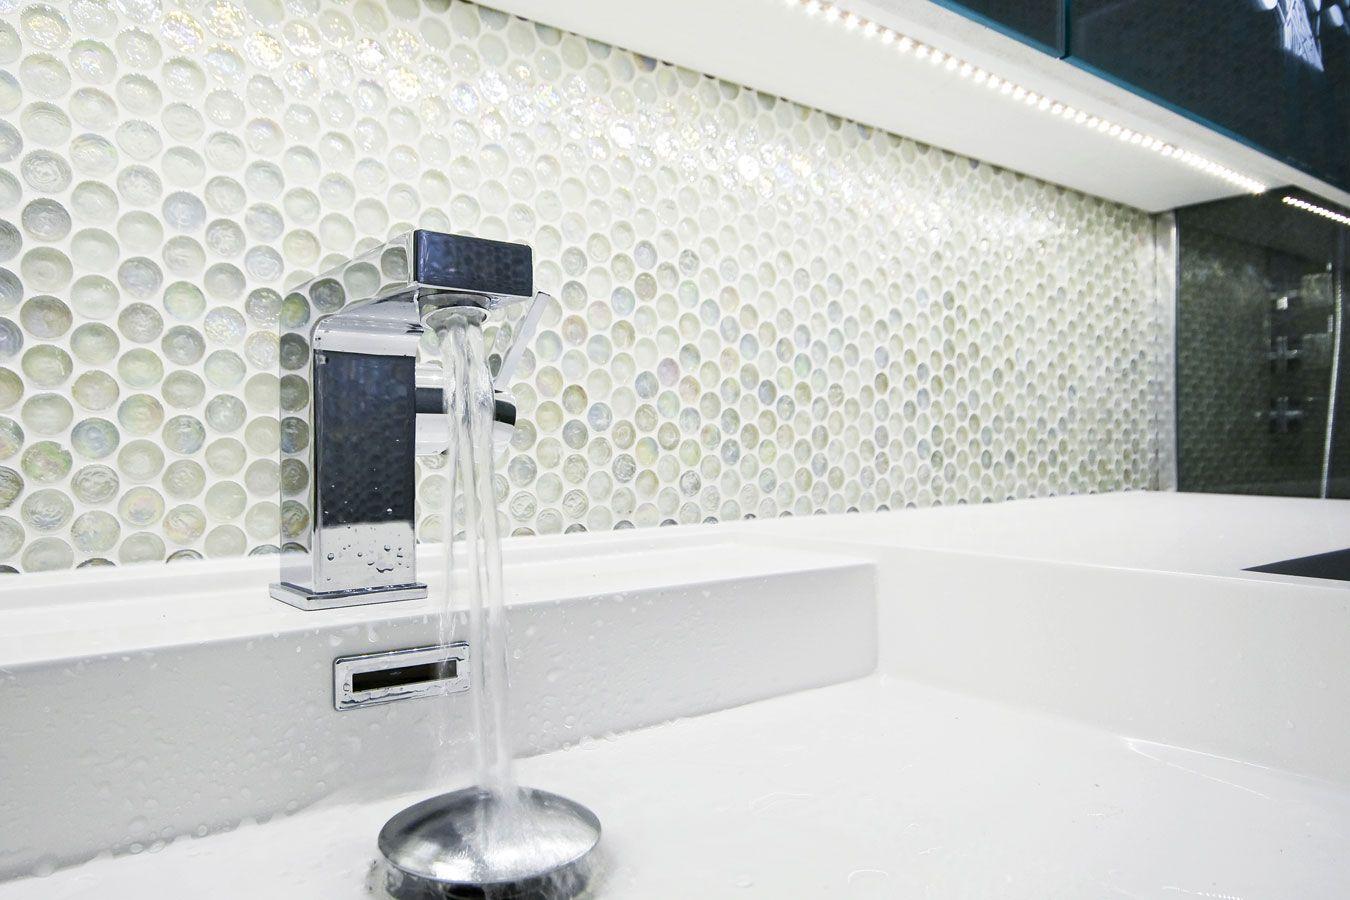 Badkamer Mozaiek Tegels : Ronde glas mozaïek tegels badkamer bathroom badkamer